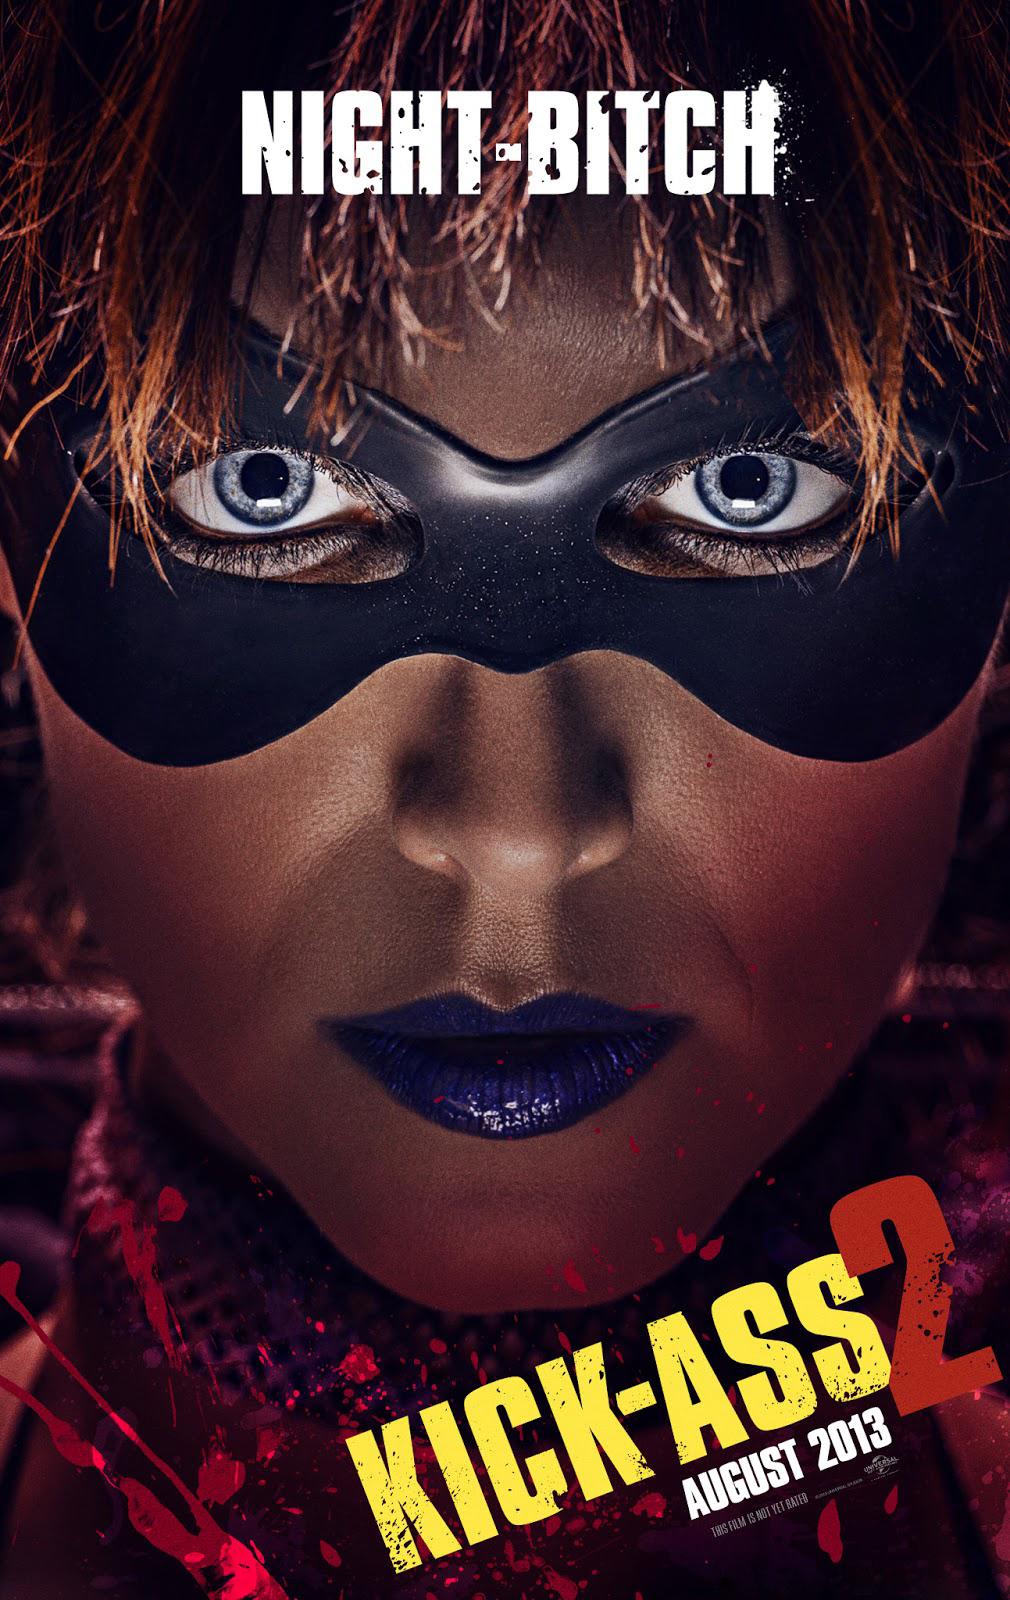 Kick-Ass 2 - Movie Poster #7 (Original)